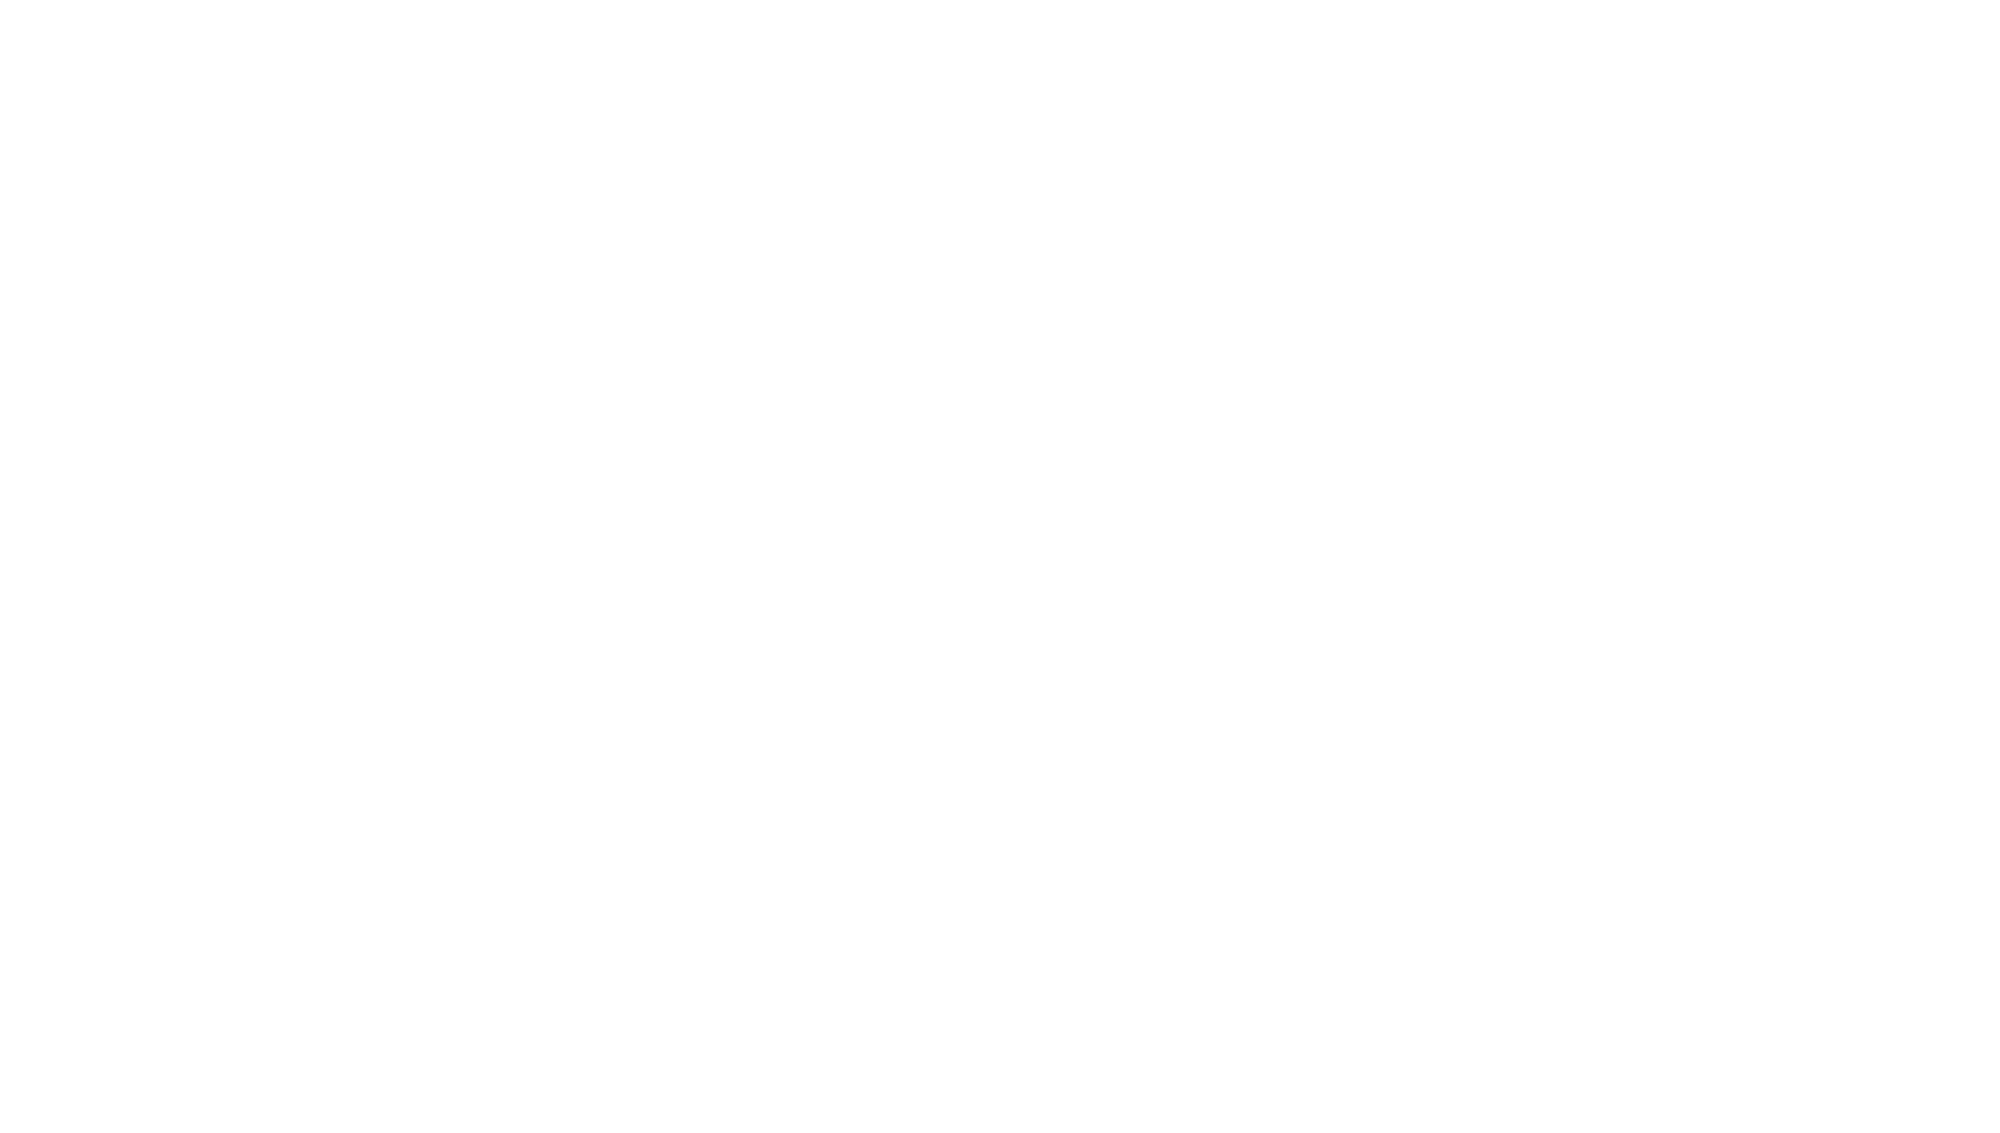 blank-2000-1133